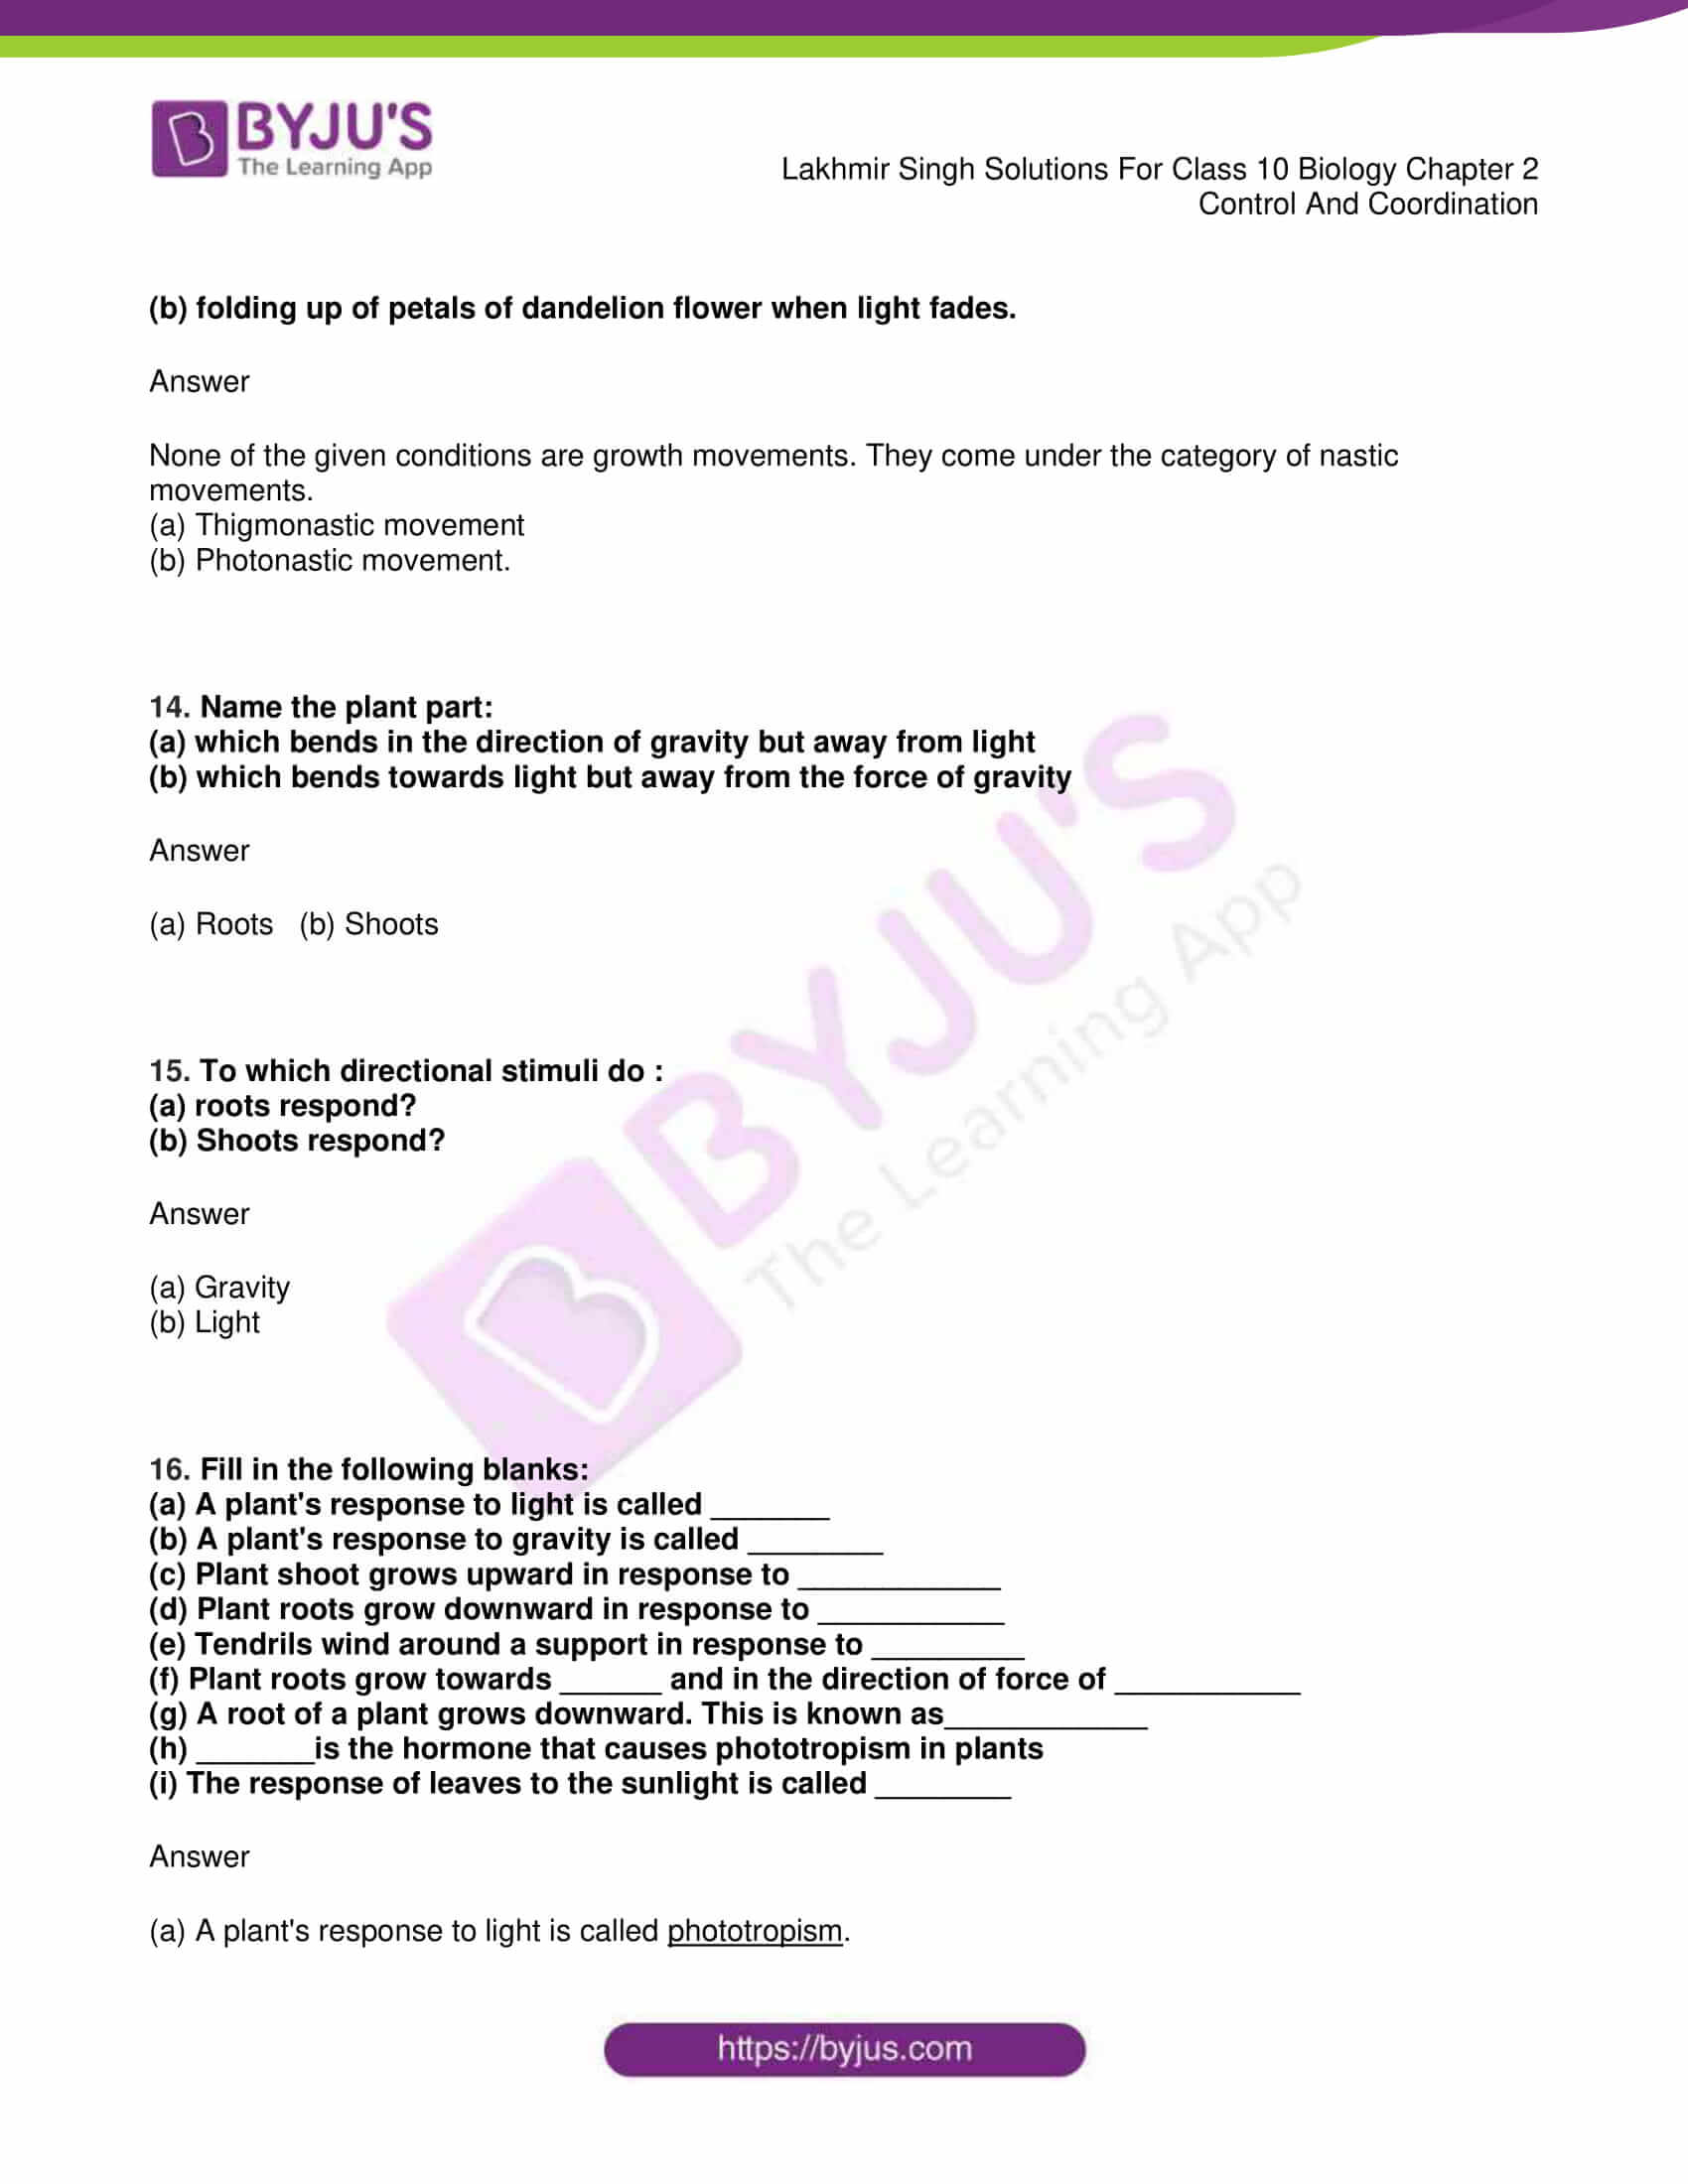 lakhmir singh sol class 10 biology chapter 2 04